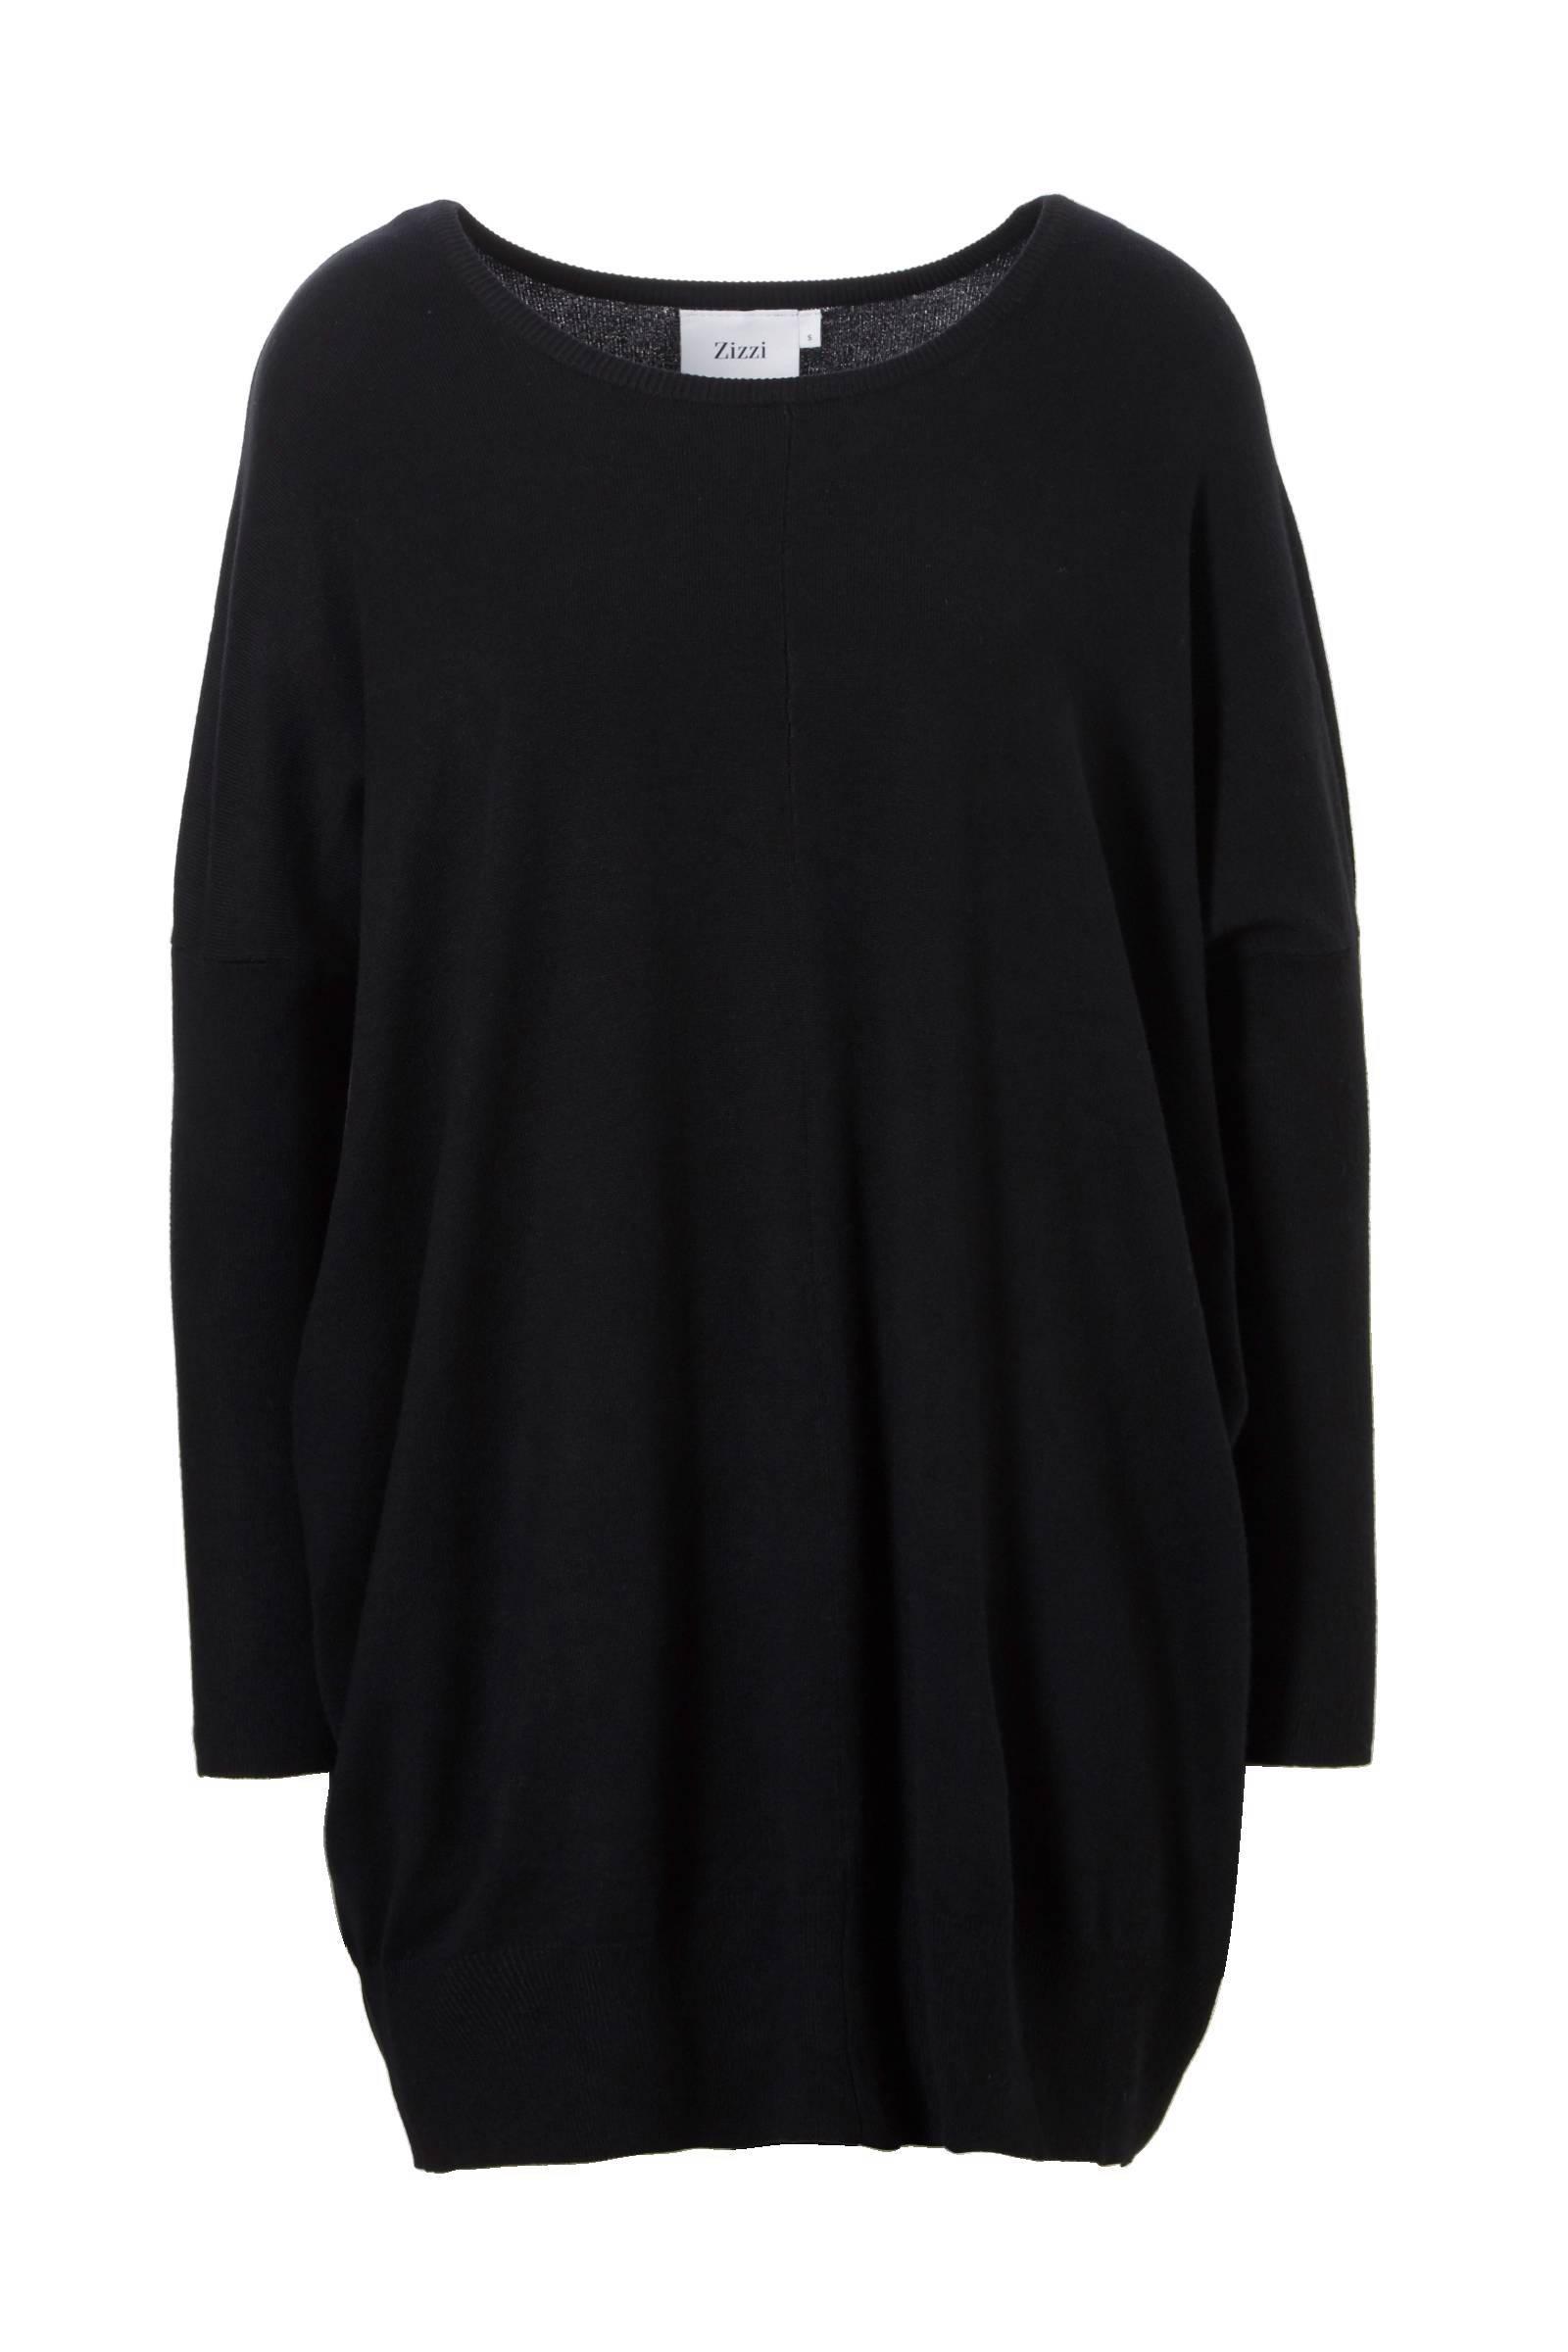 zwarte pullover dames